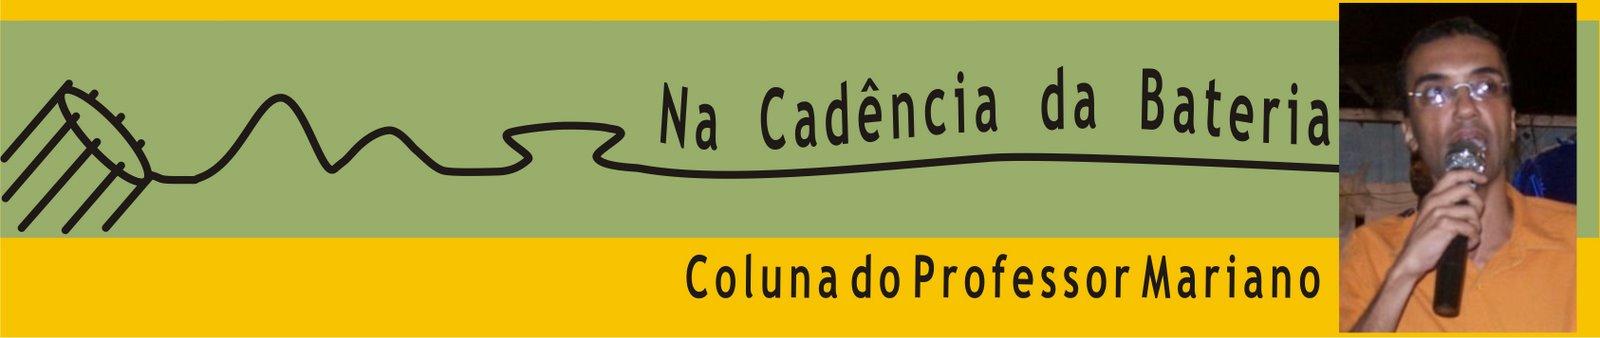 ncbcolunamariano